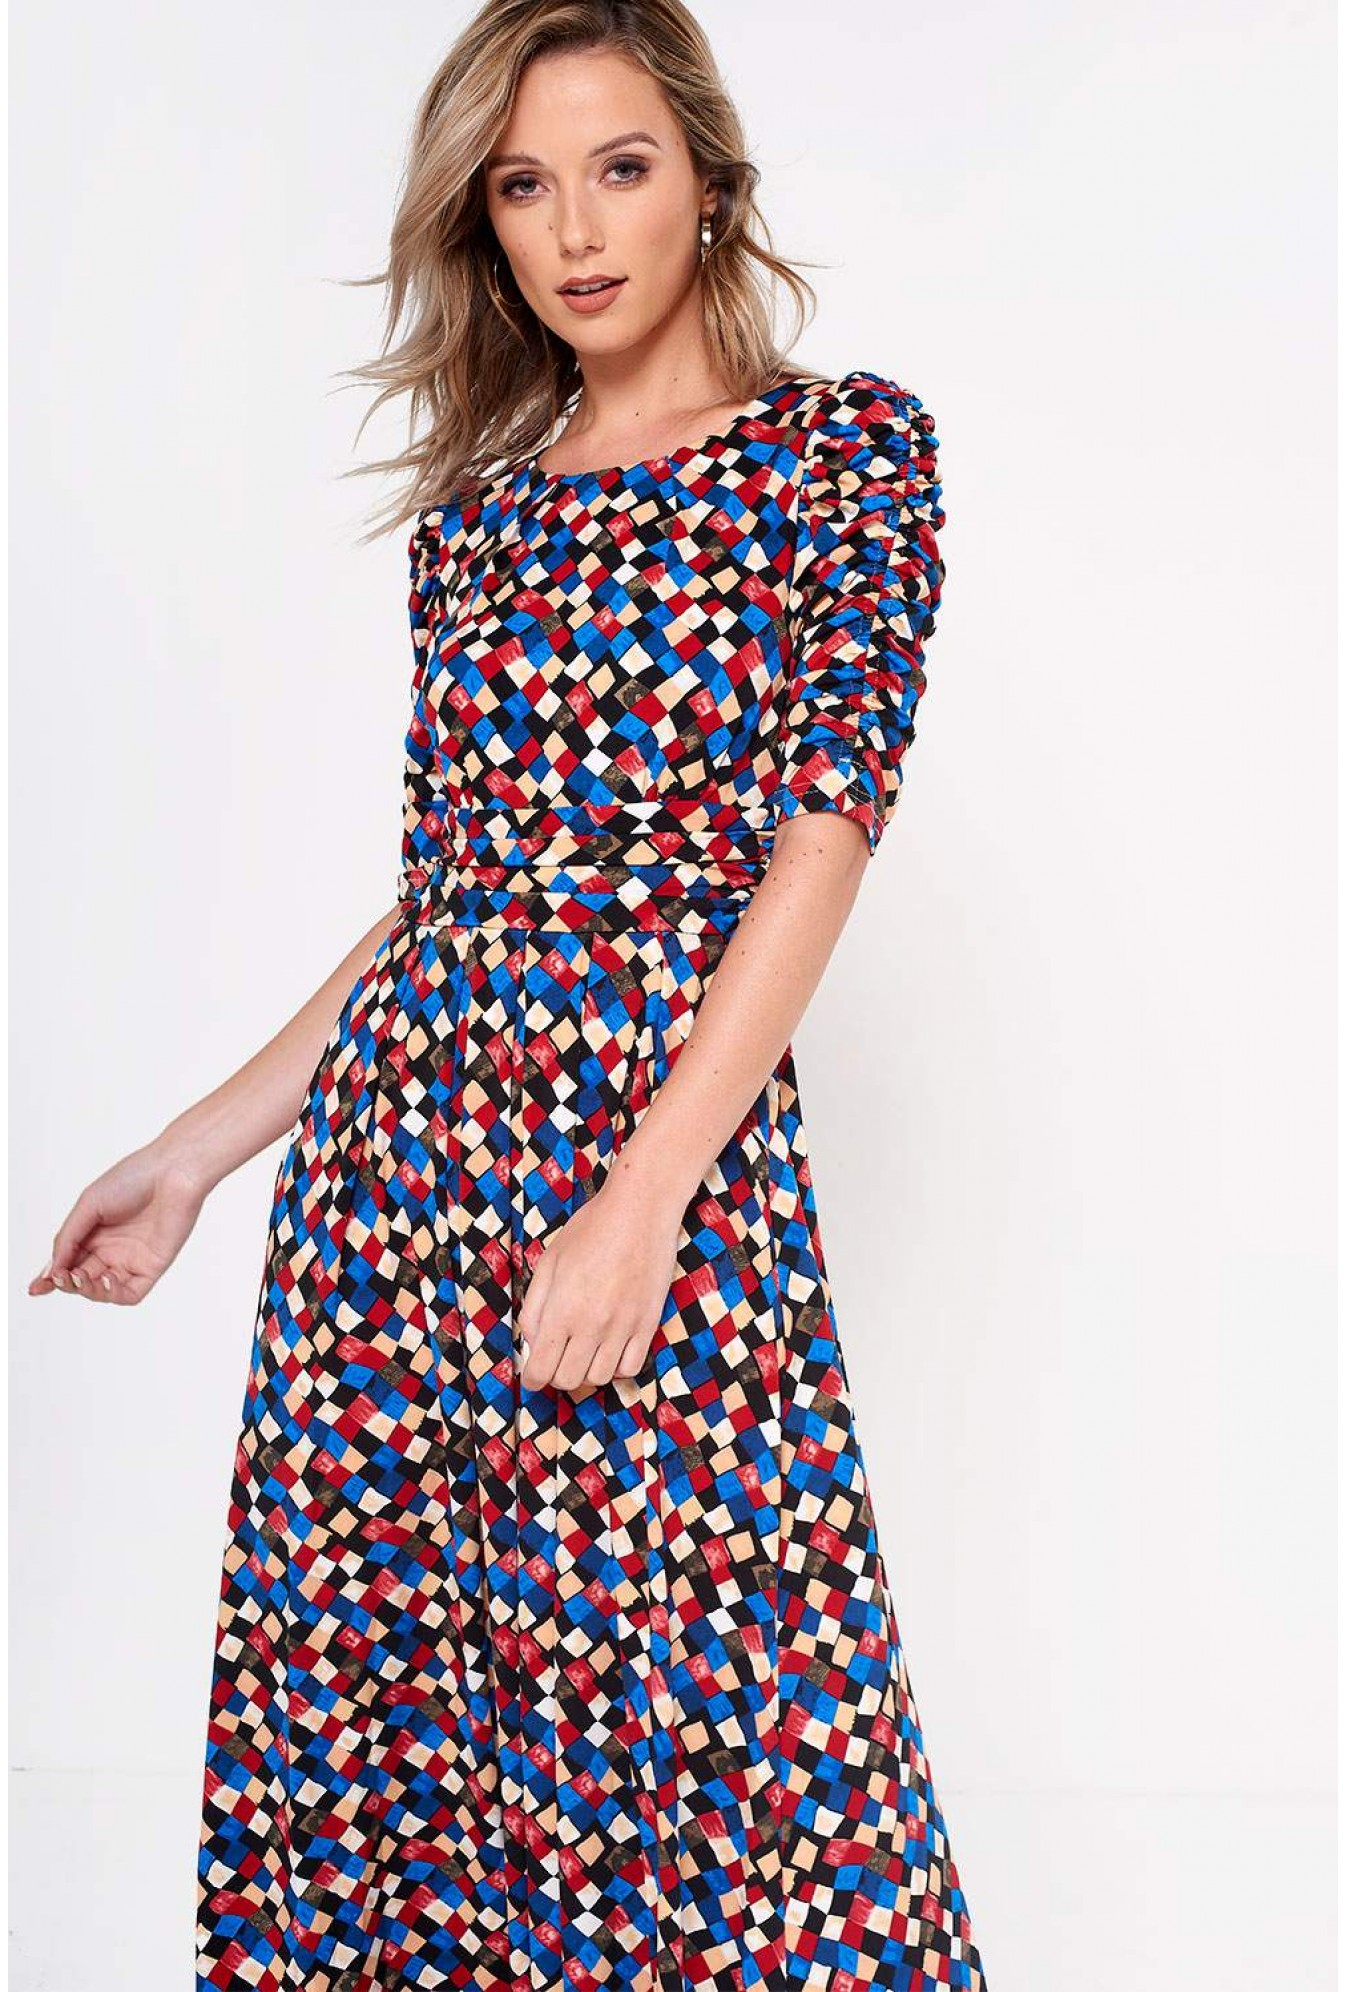 e5b14f0b699f3 Jolie Moi Charlotte Geometric Print Maxi Jersey Dress | iCLOTHING